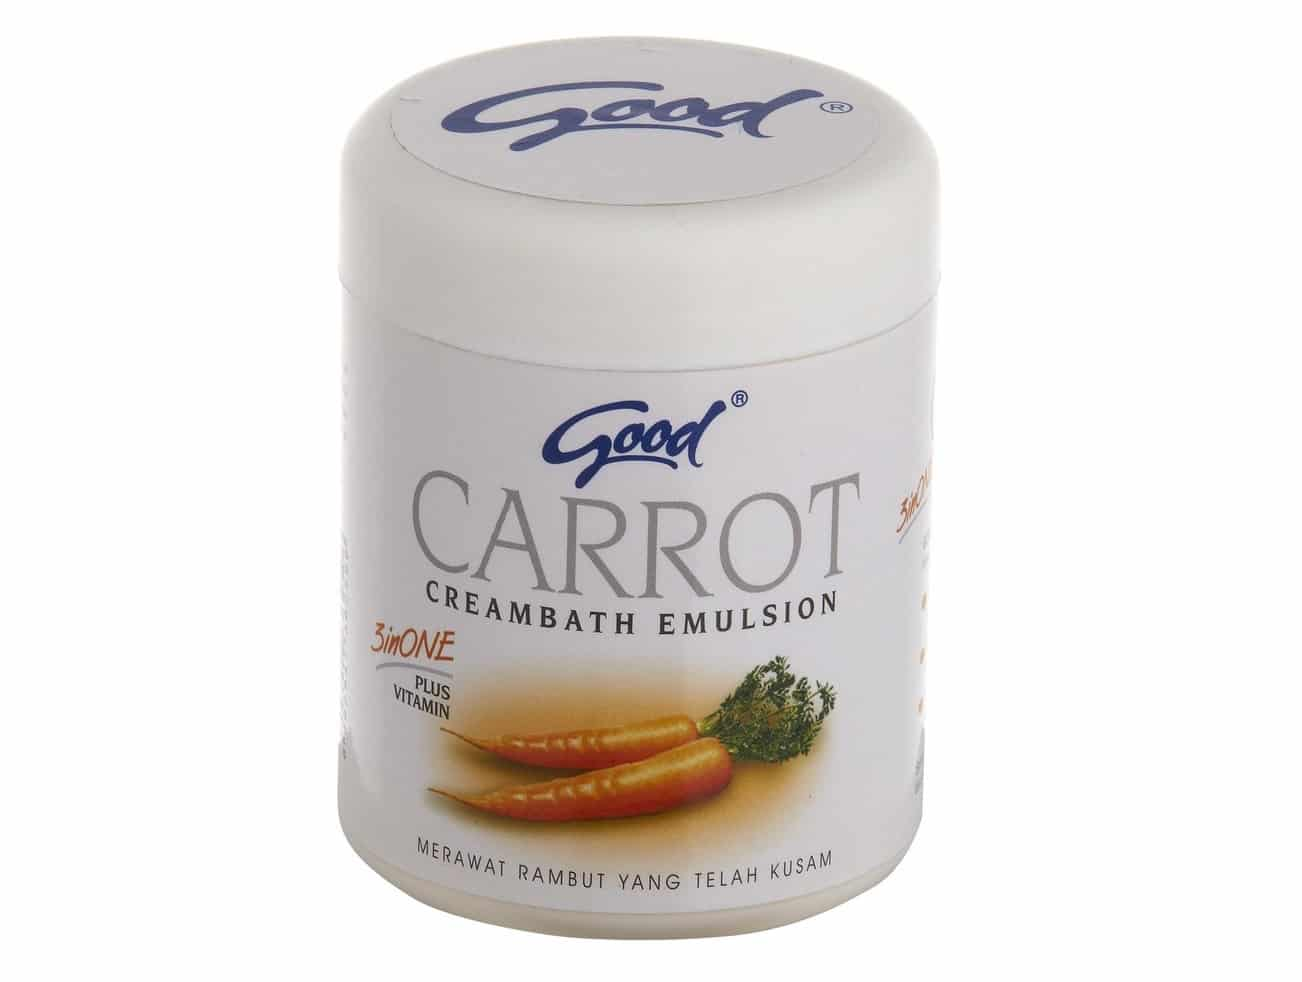 Good-Carrot